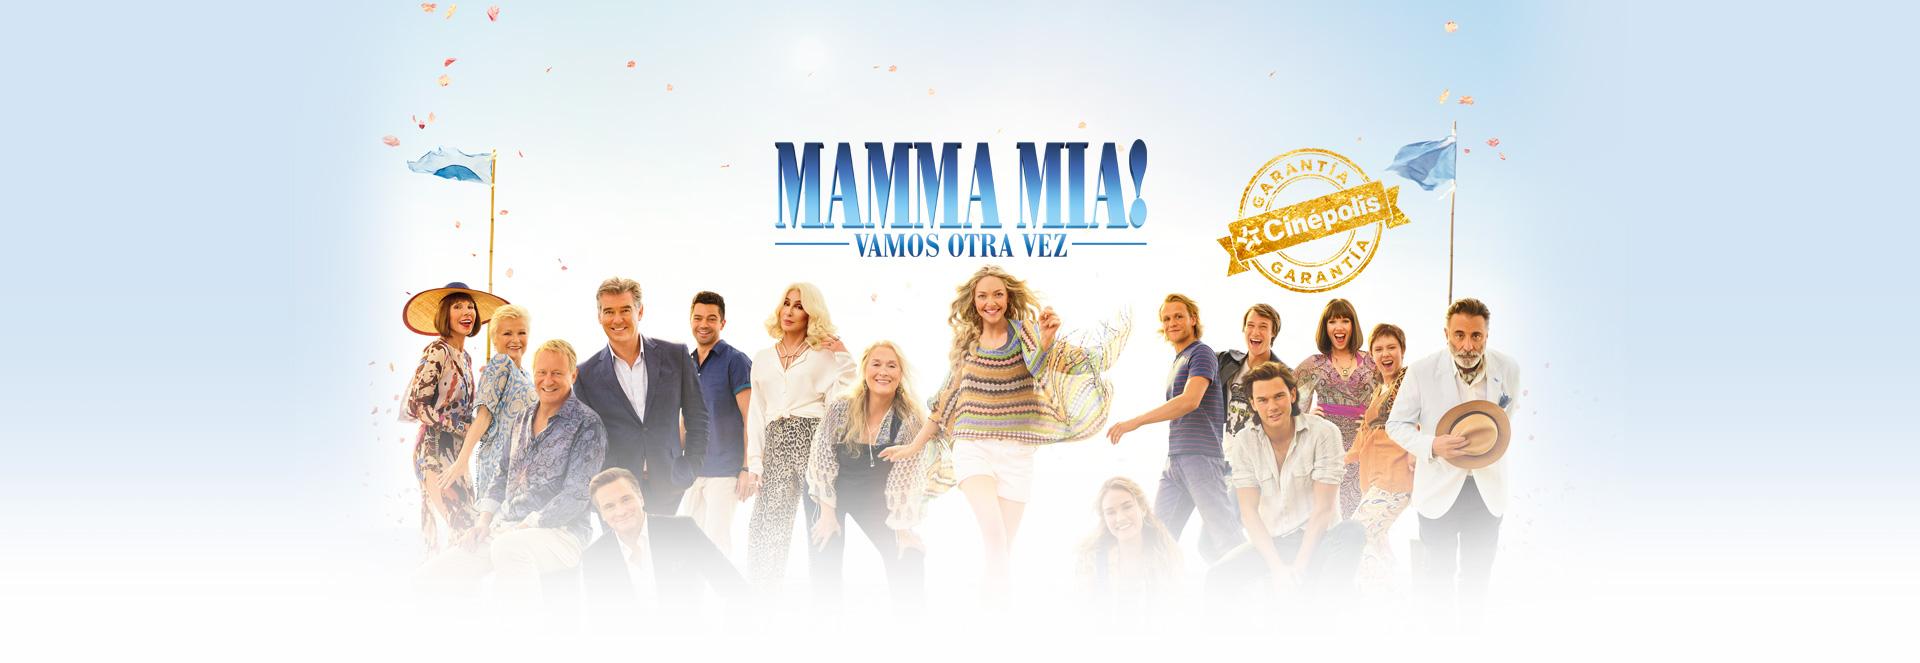 Banner Mamma mia! Vamos otra vez   Garantía Cinépolis